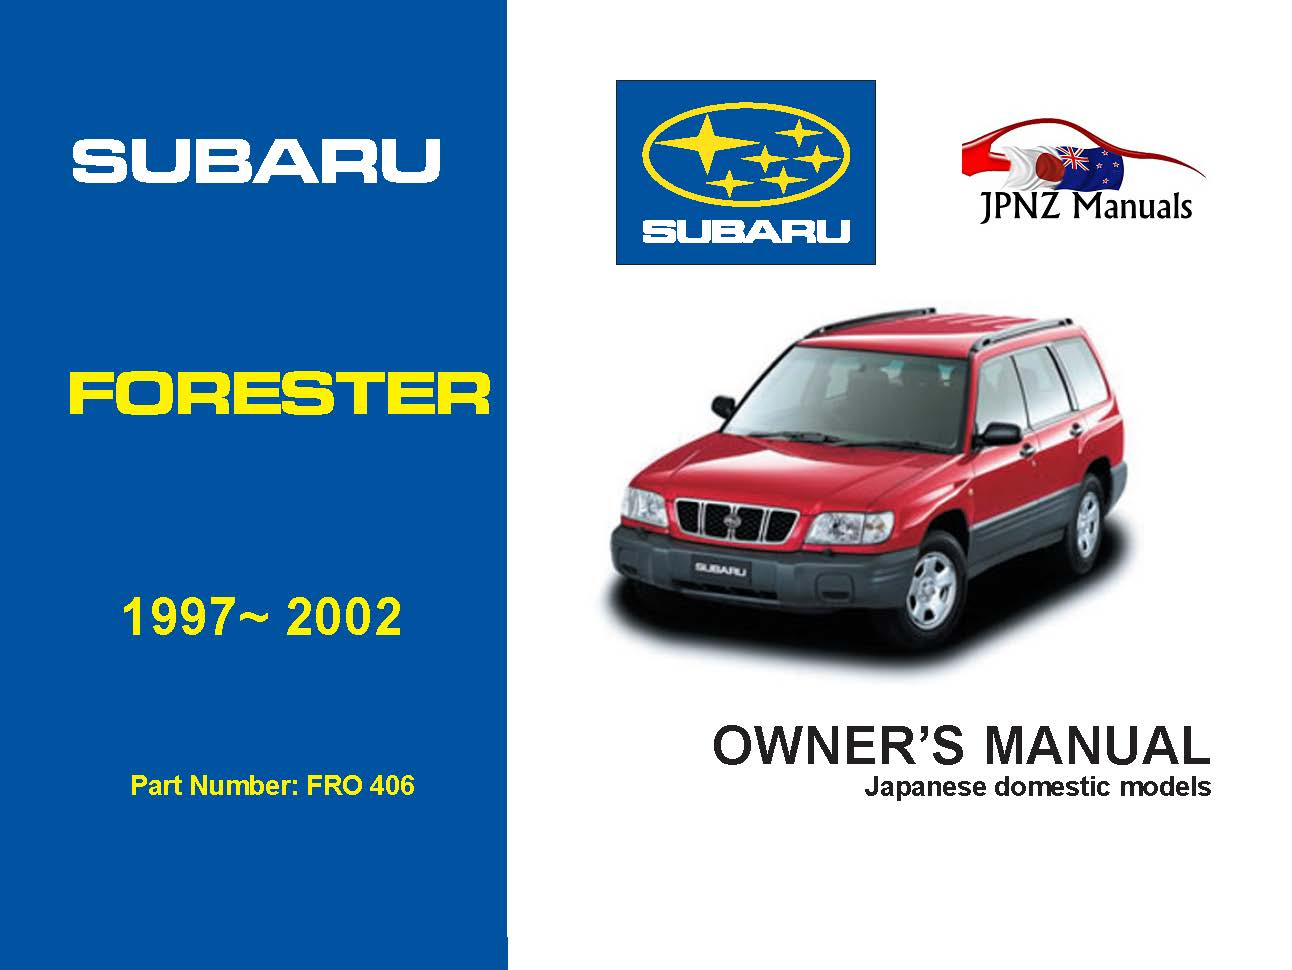 Subaru - Forester Car Owners User Manual In English | 1997 - 2002